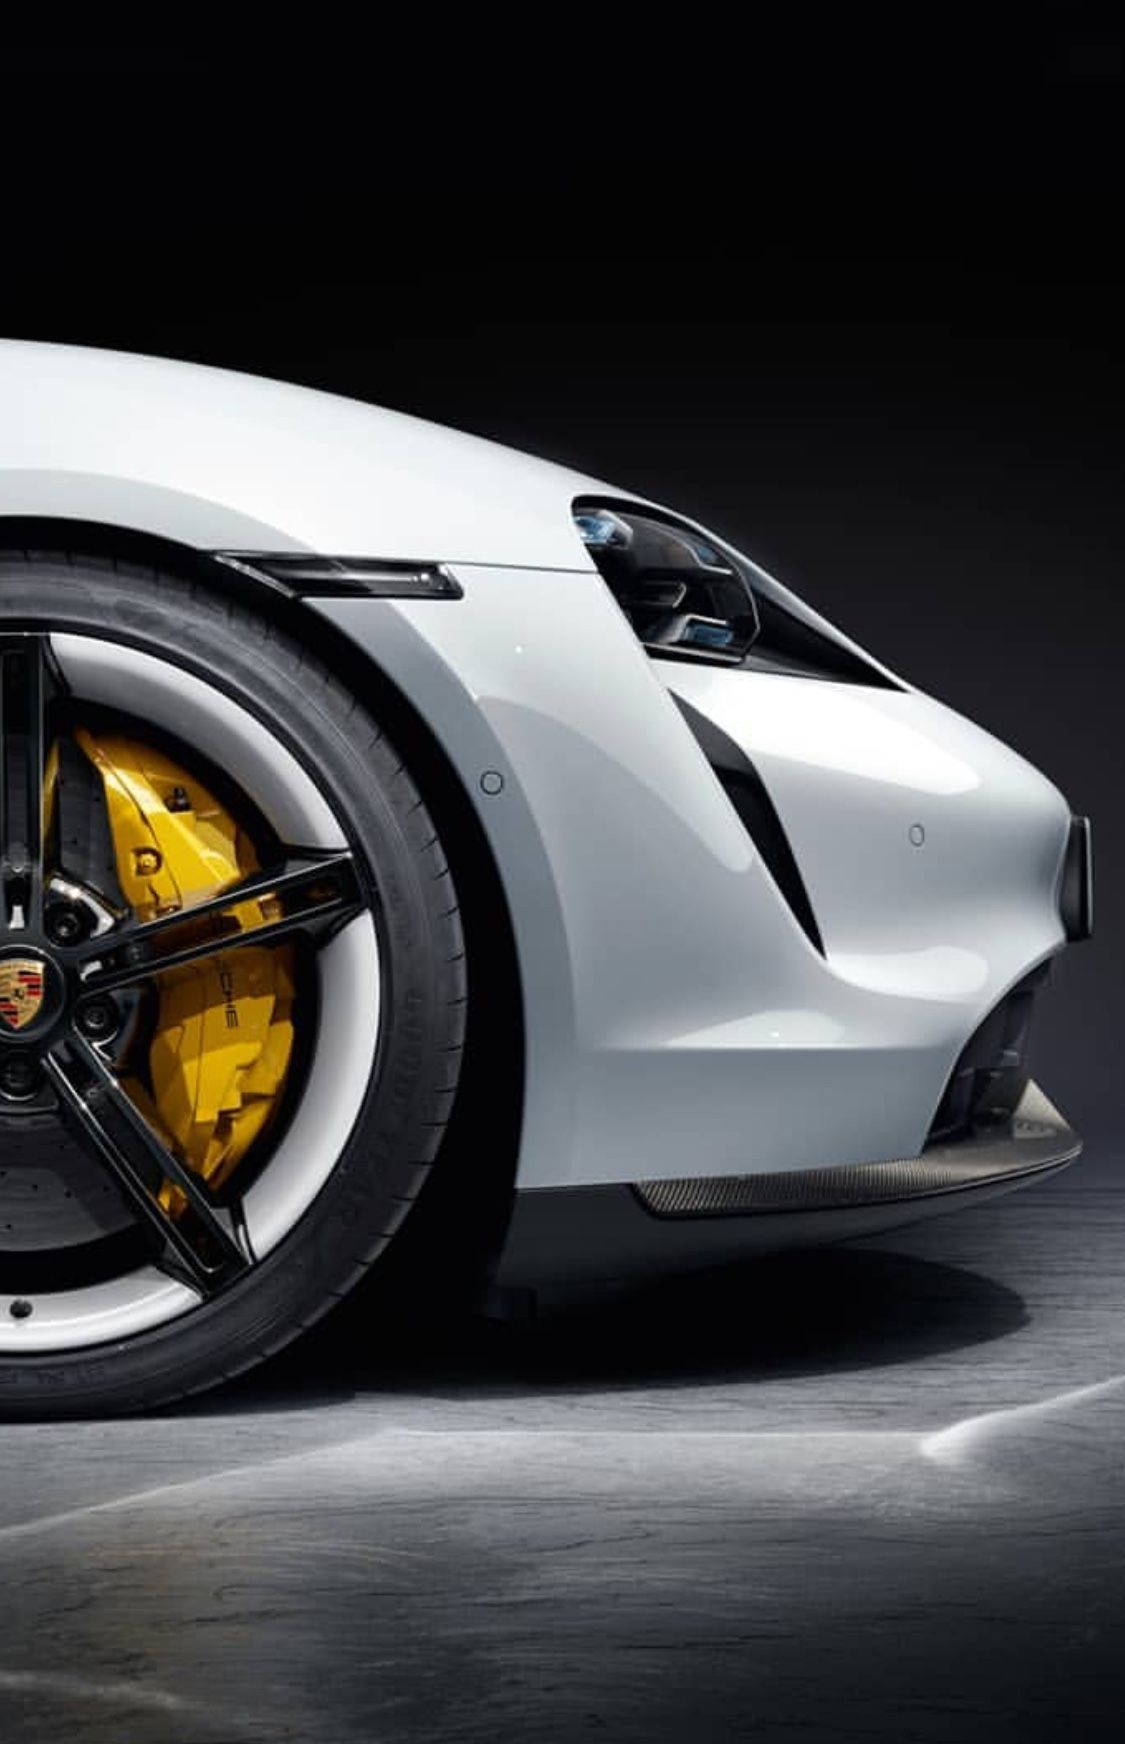 Porsche Taycan Porsche taycan, Car pictures, Beautiful cars